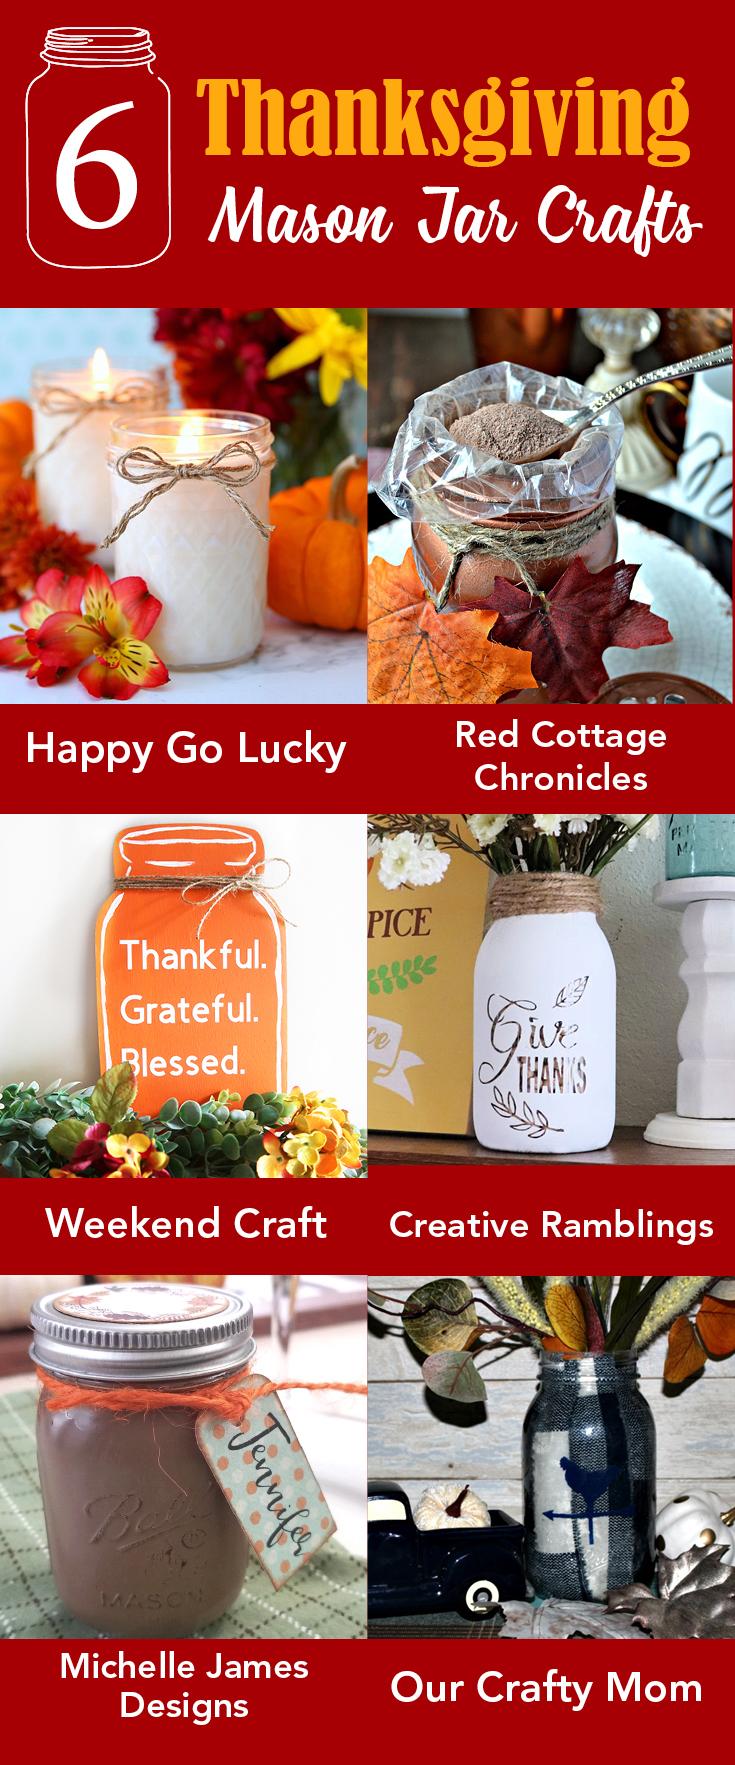 6 Thanksgiving Mason Jar Crafts